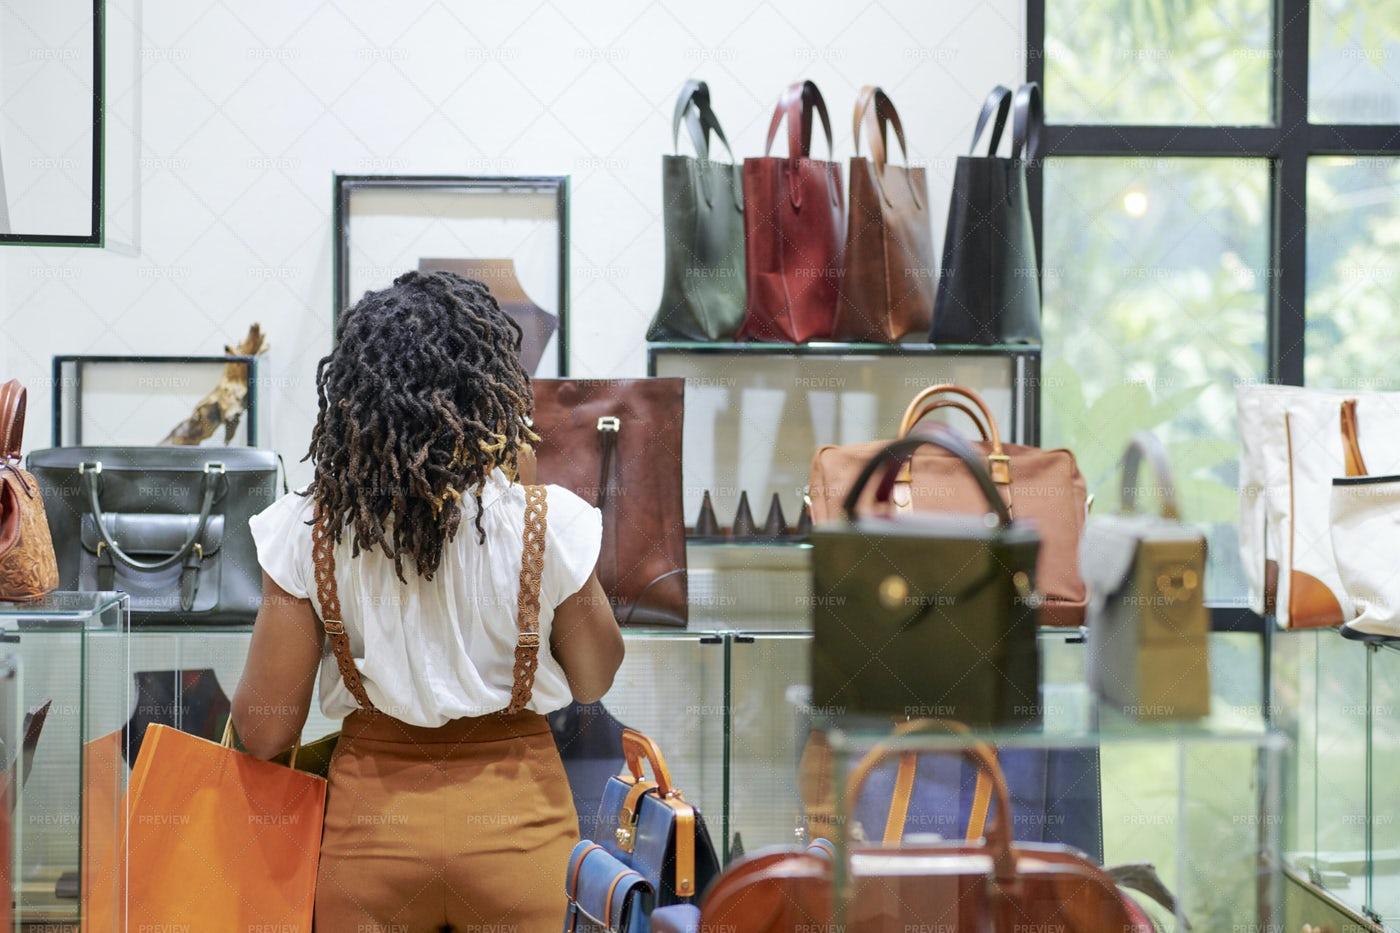 Woman Looking At Bag On Shelves: Stock Photos